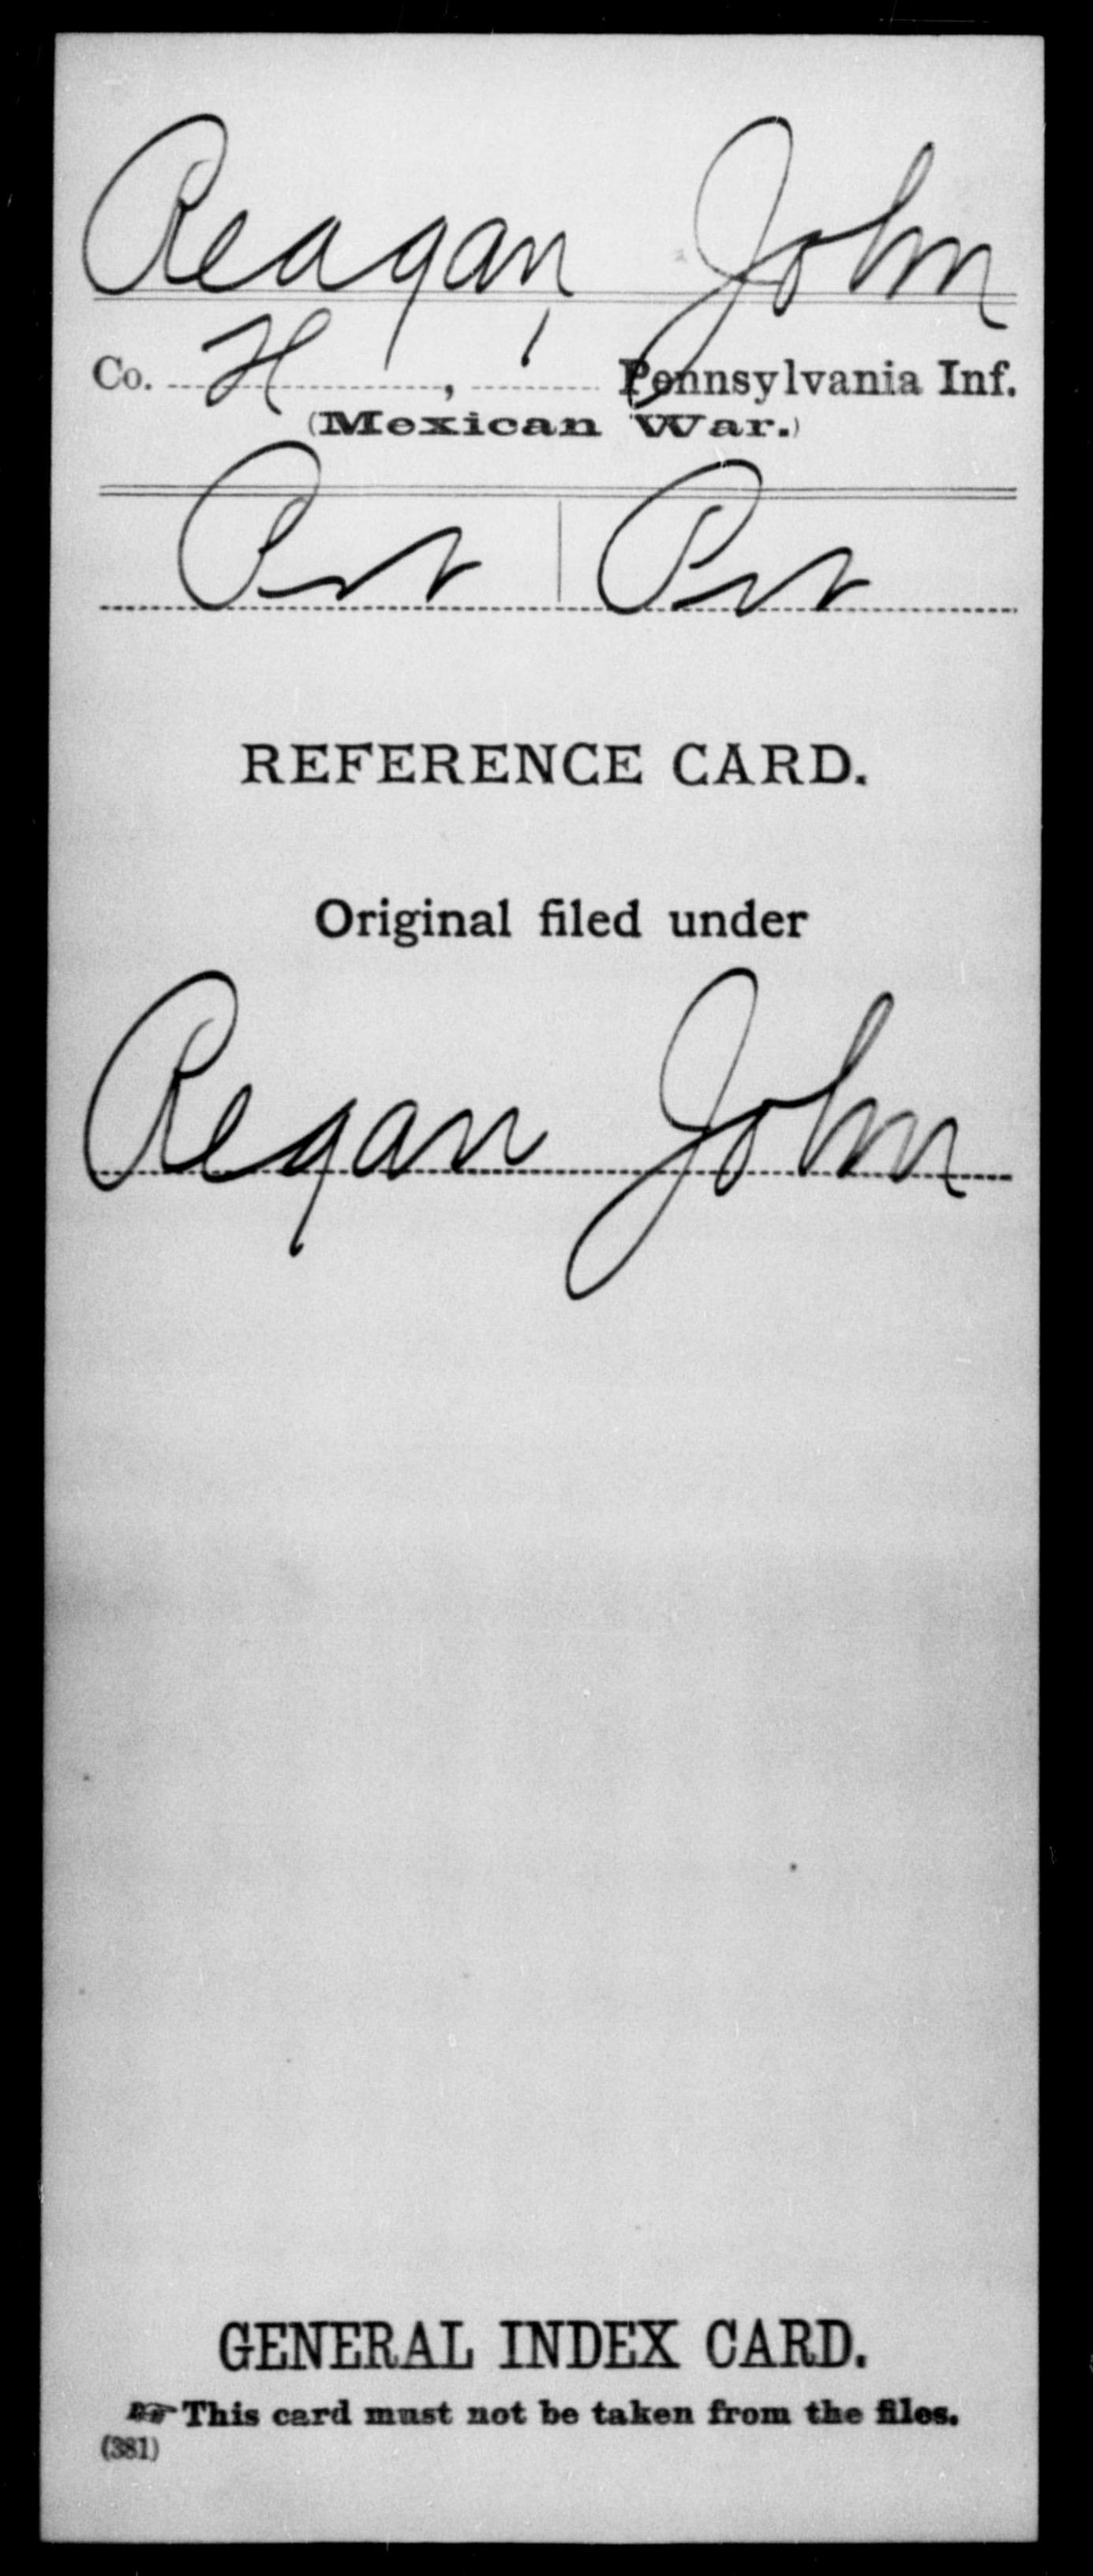 Reagan, John - State: Pennsylvania - Regiment: 1 Pennsylvania Infantry, Company H - Enlistment Rank: Pvt - Discharge Rank: Pvt